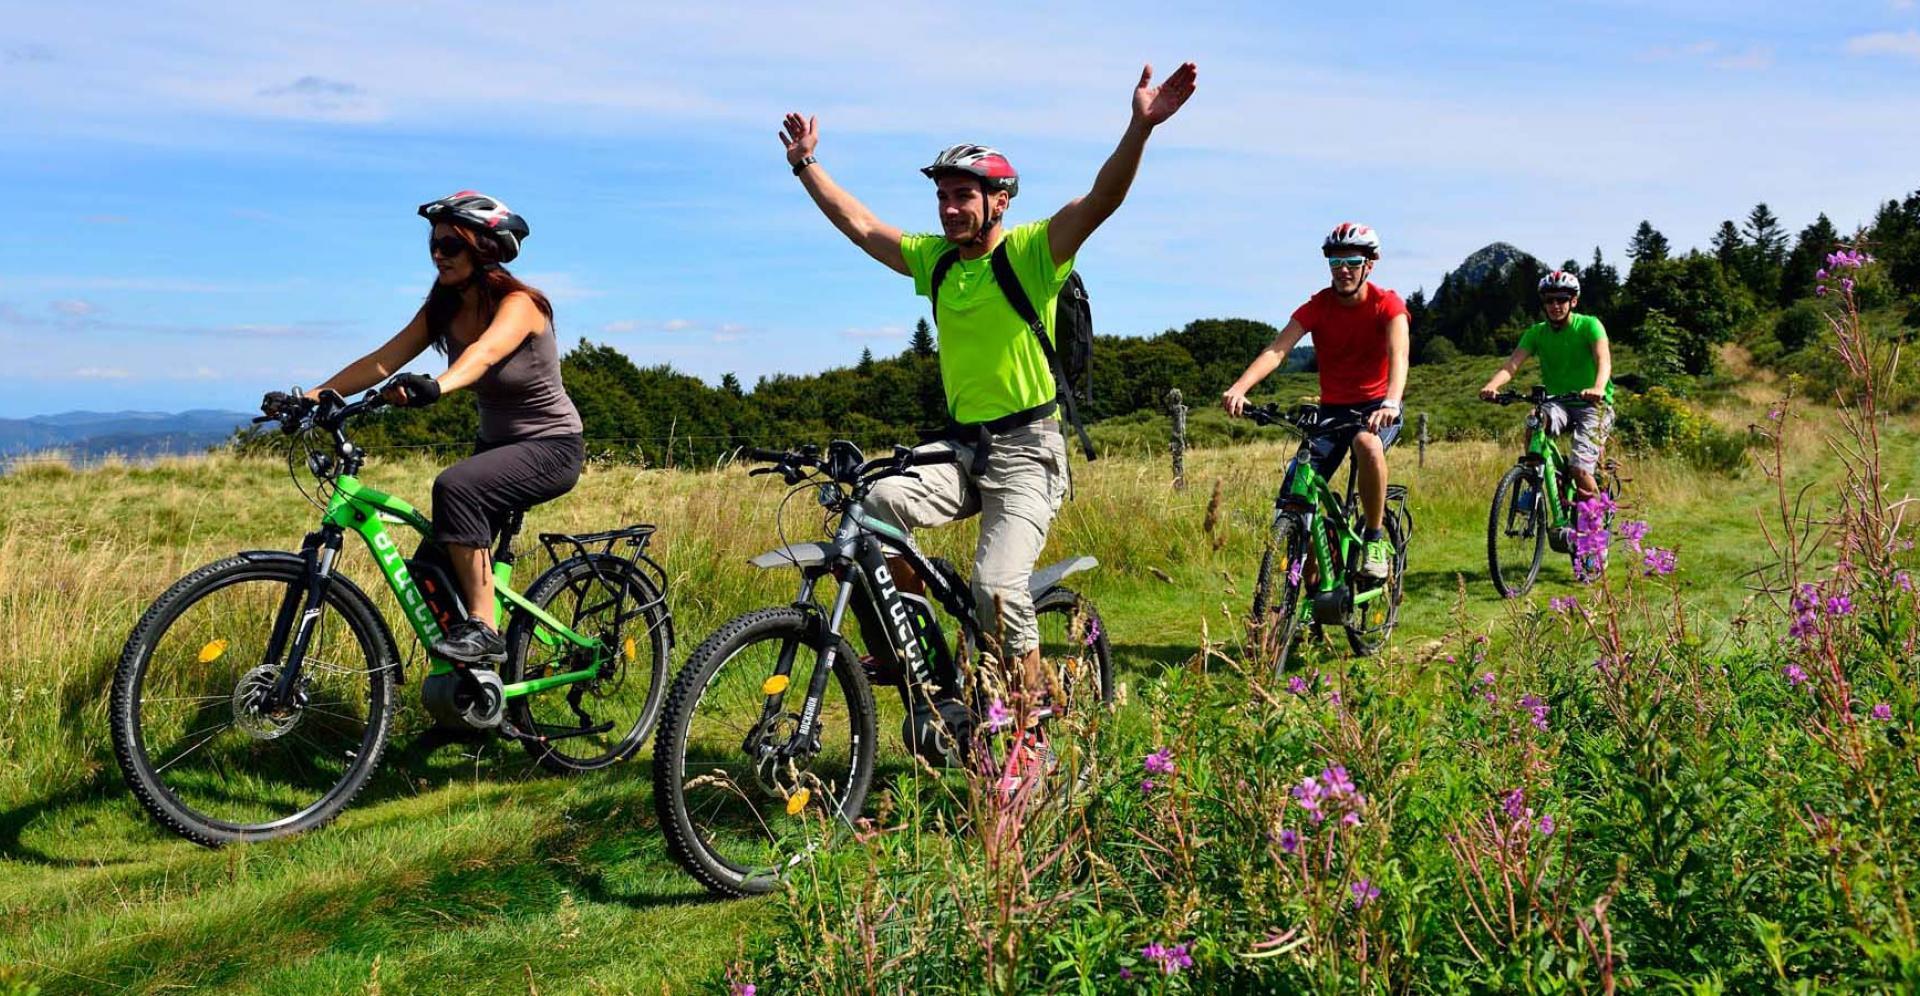 Tourisme en Ardèche : L'Ardèche à Vélo